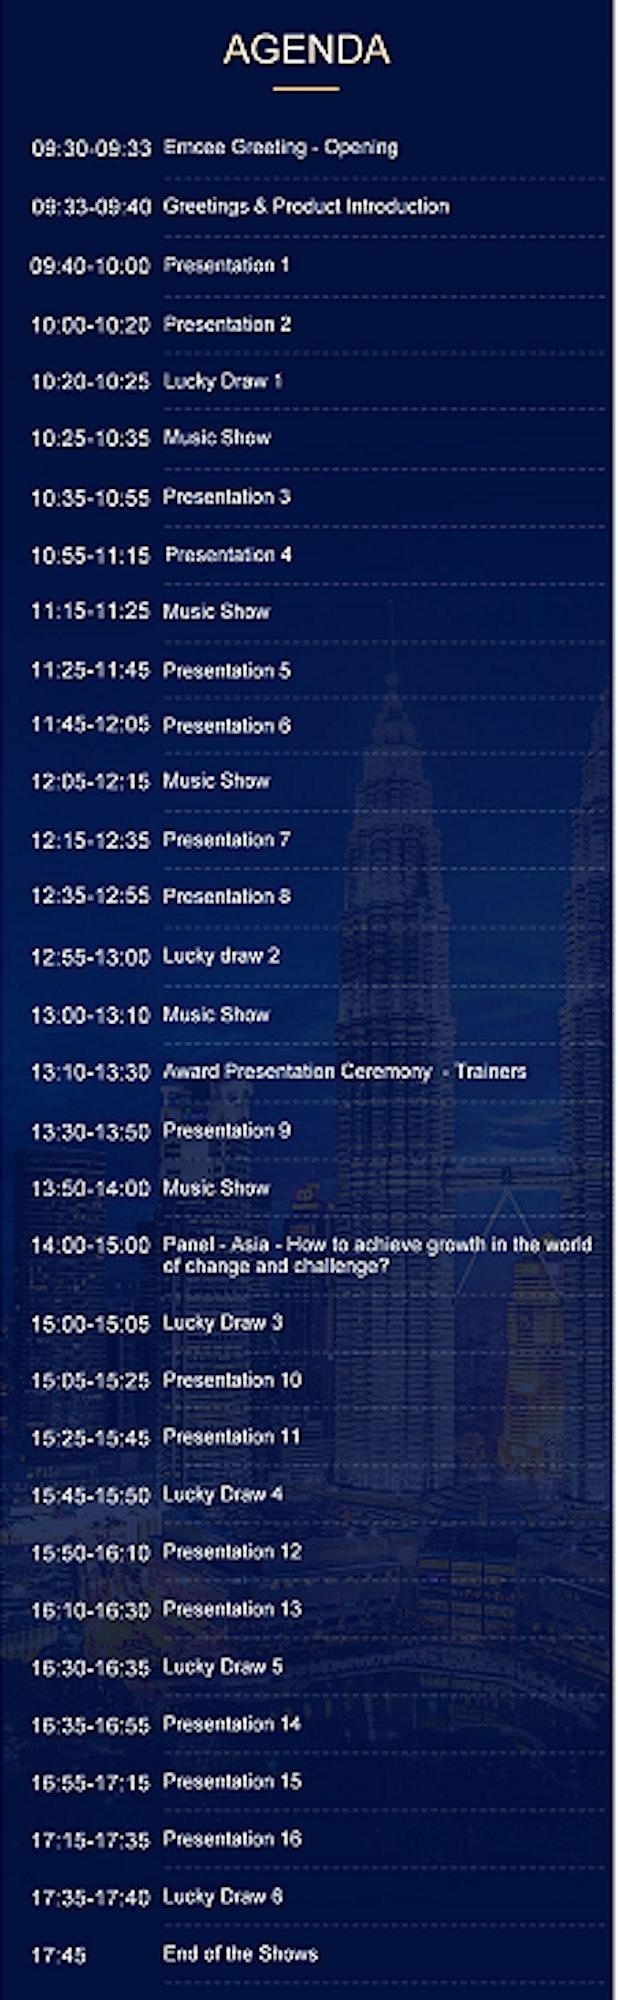 Wiki Finance EXPO Kuala Lumpur 2021 image